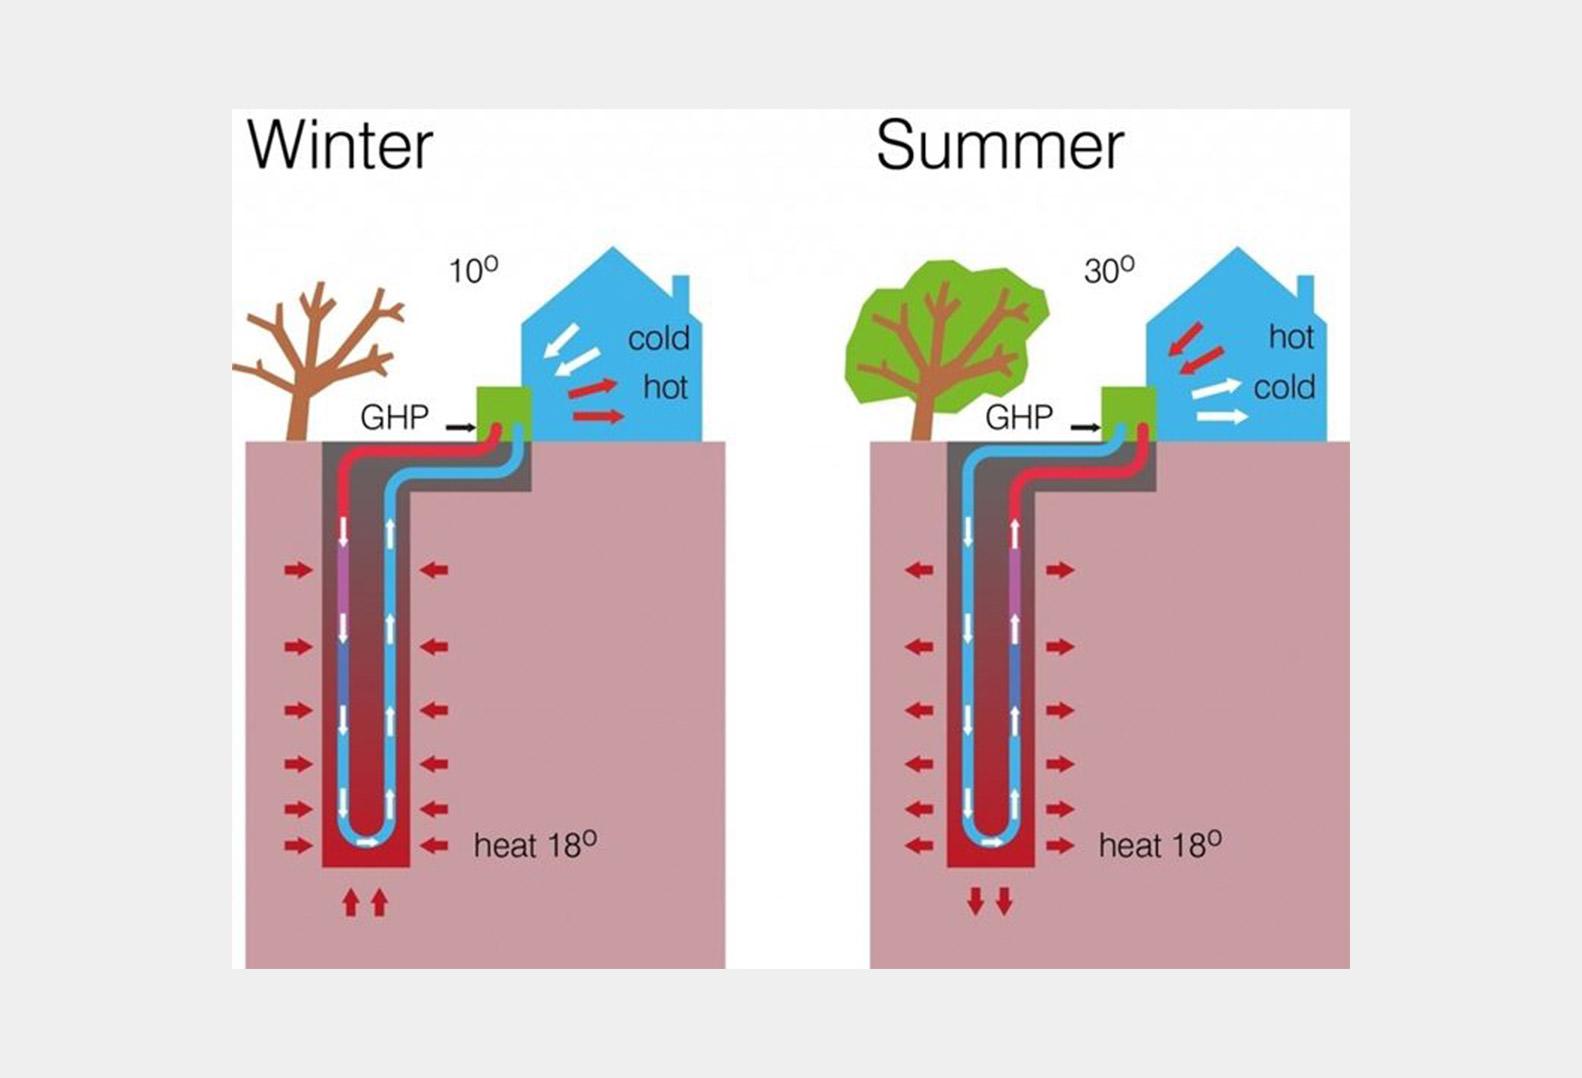 Operation of Geothermal Heat Pumps illustration